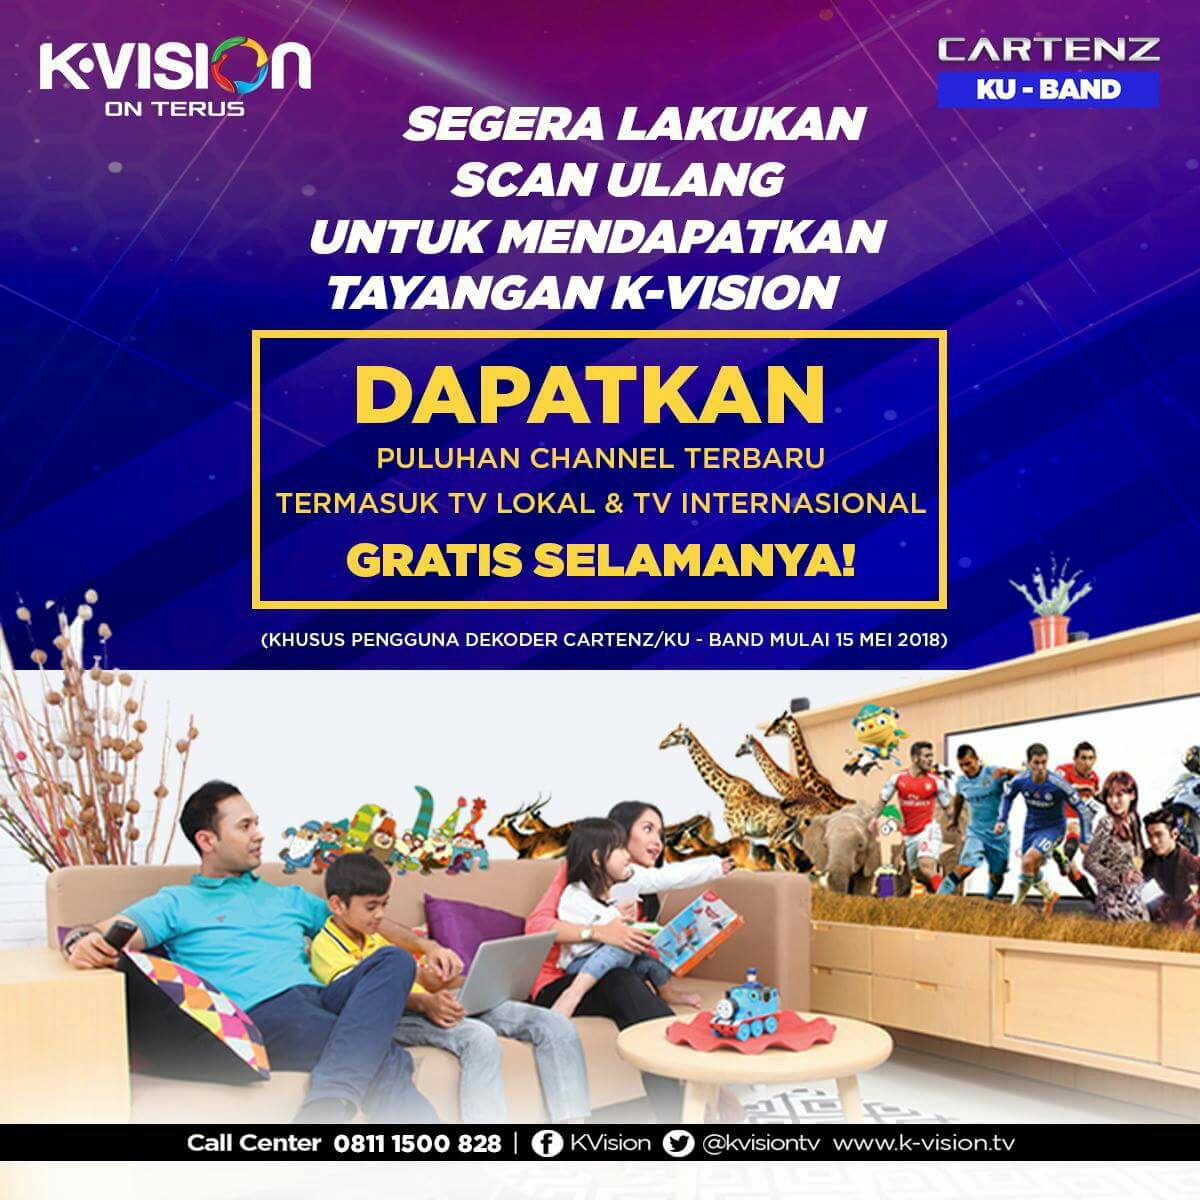 Dapat Kan Channel Tv Lokal Dan Internasional Gratis Di K Vision Paket Family Parabola Ku Band C Tvkuindo 085 70 22 11 8